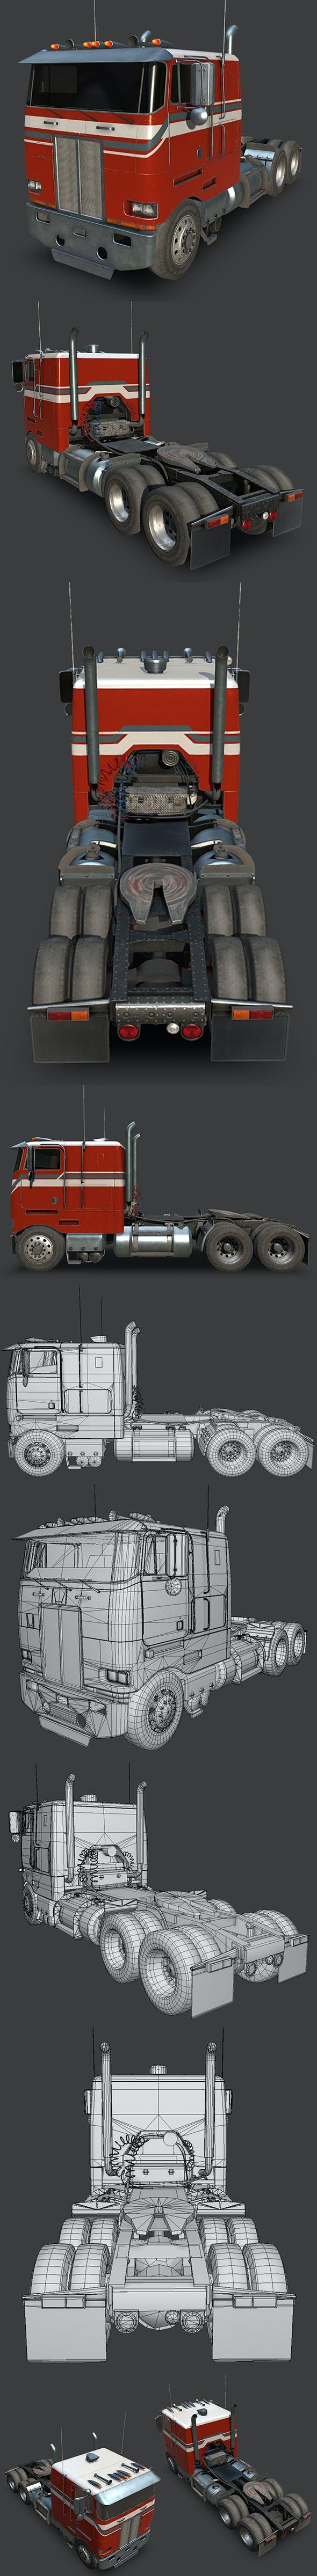 Peterbilt 362 Truck 1985 - 3DOcean Item for Sale